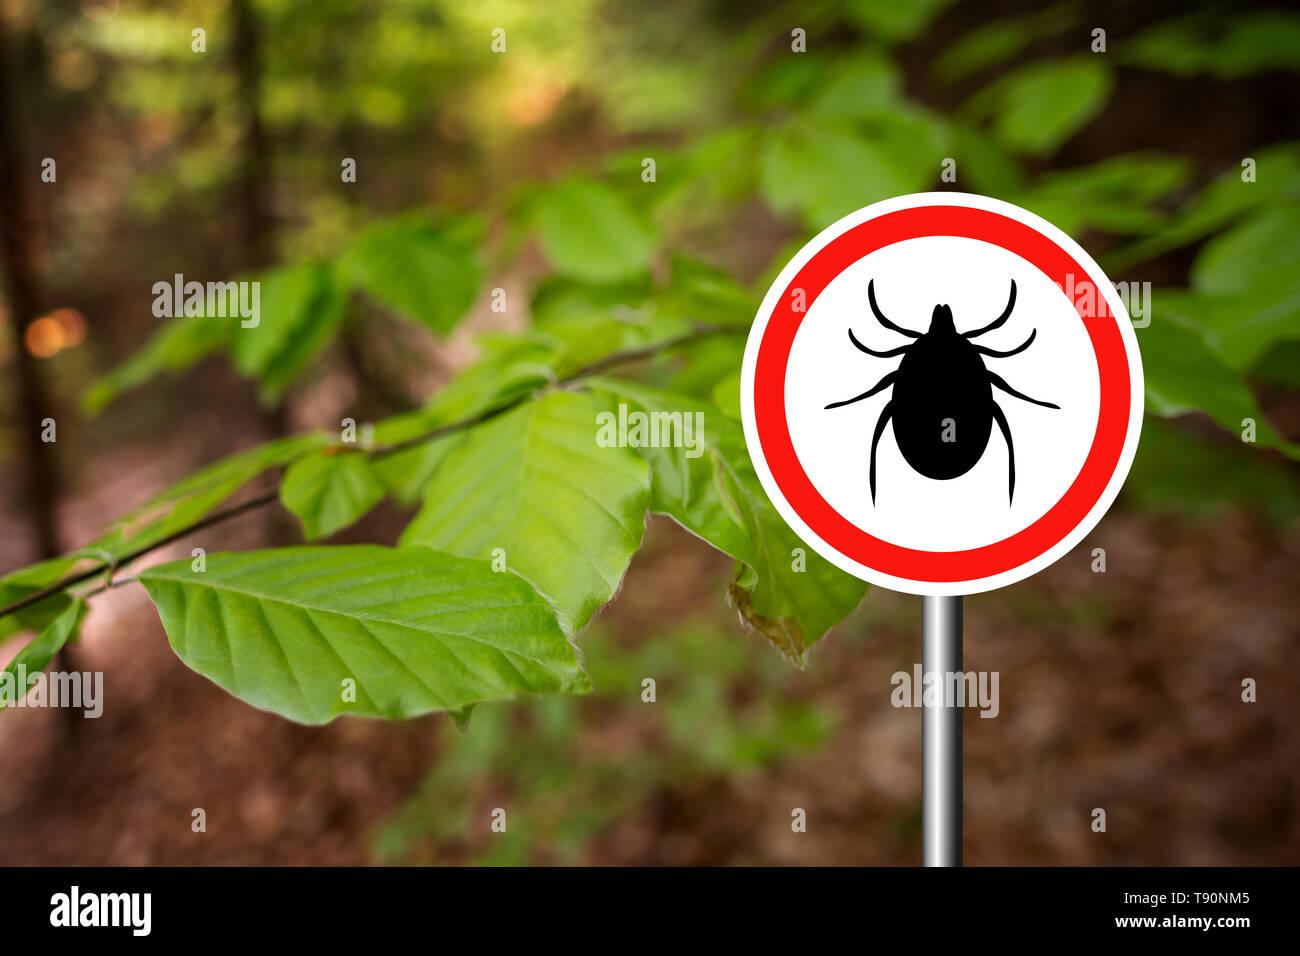 Vector Borne Illness Photos & Vector Borne Illness Images - Alamy